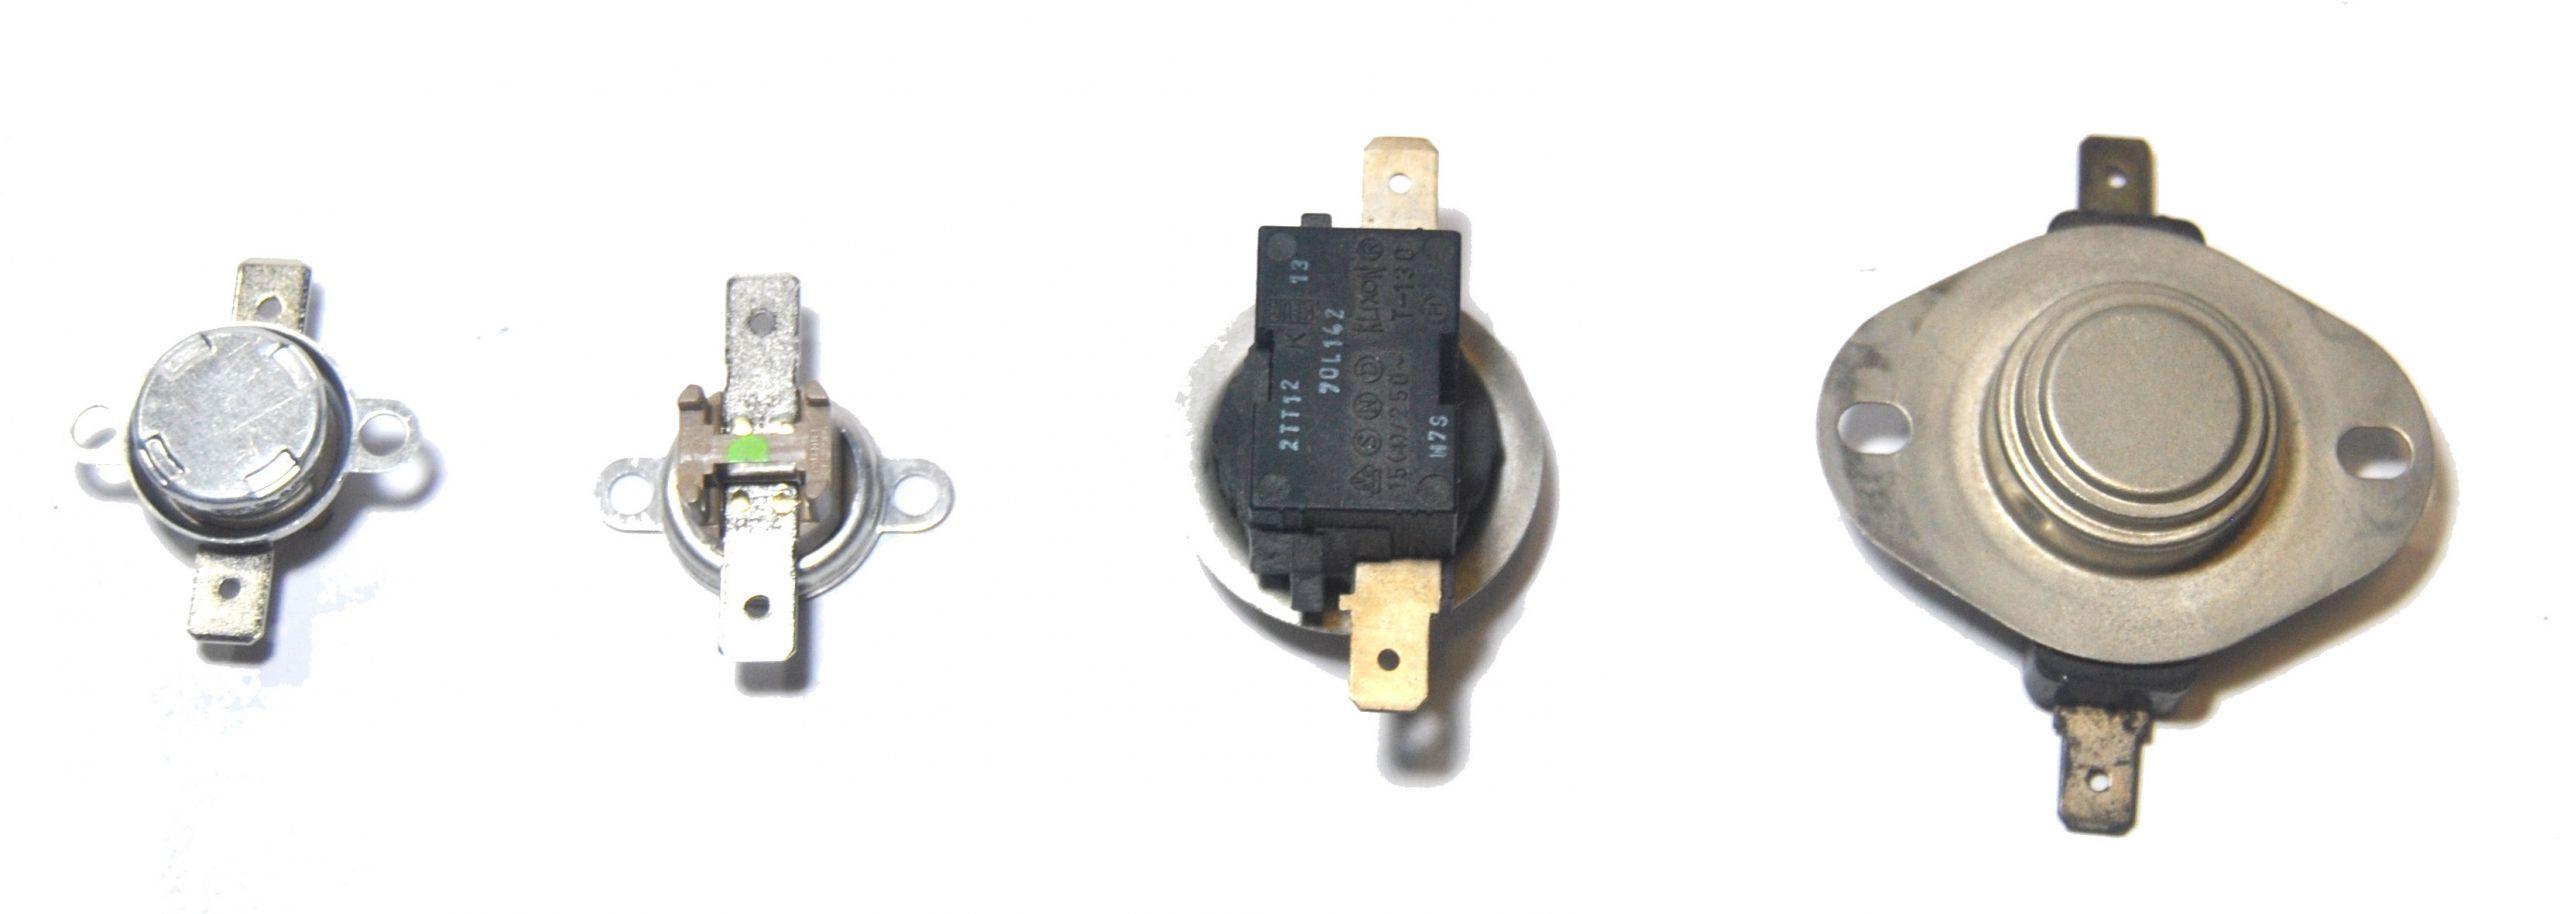 termostatos de contacto